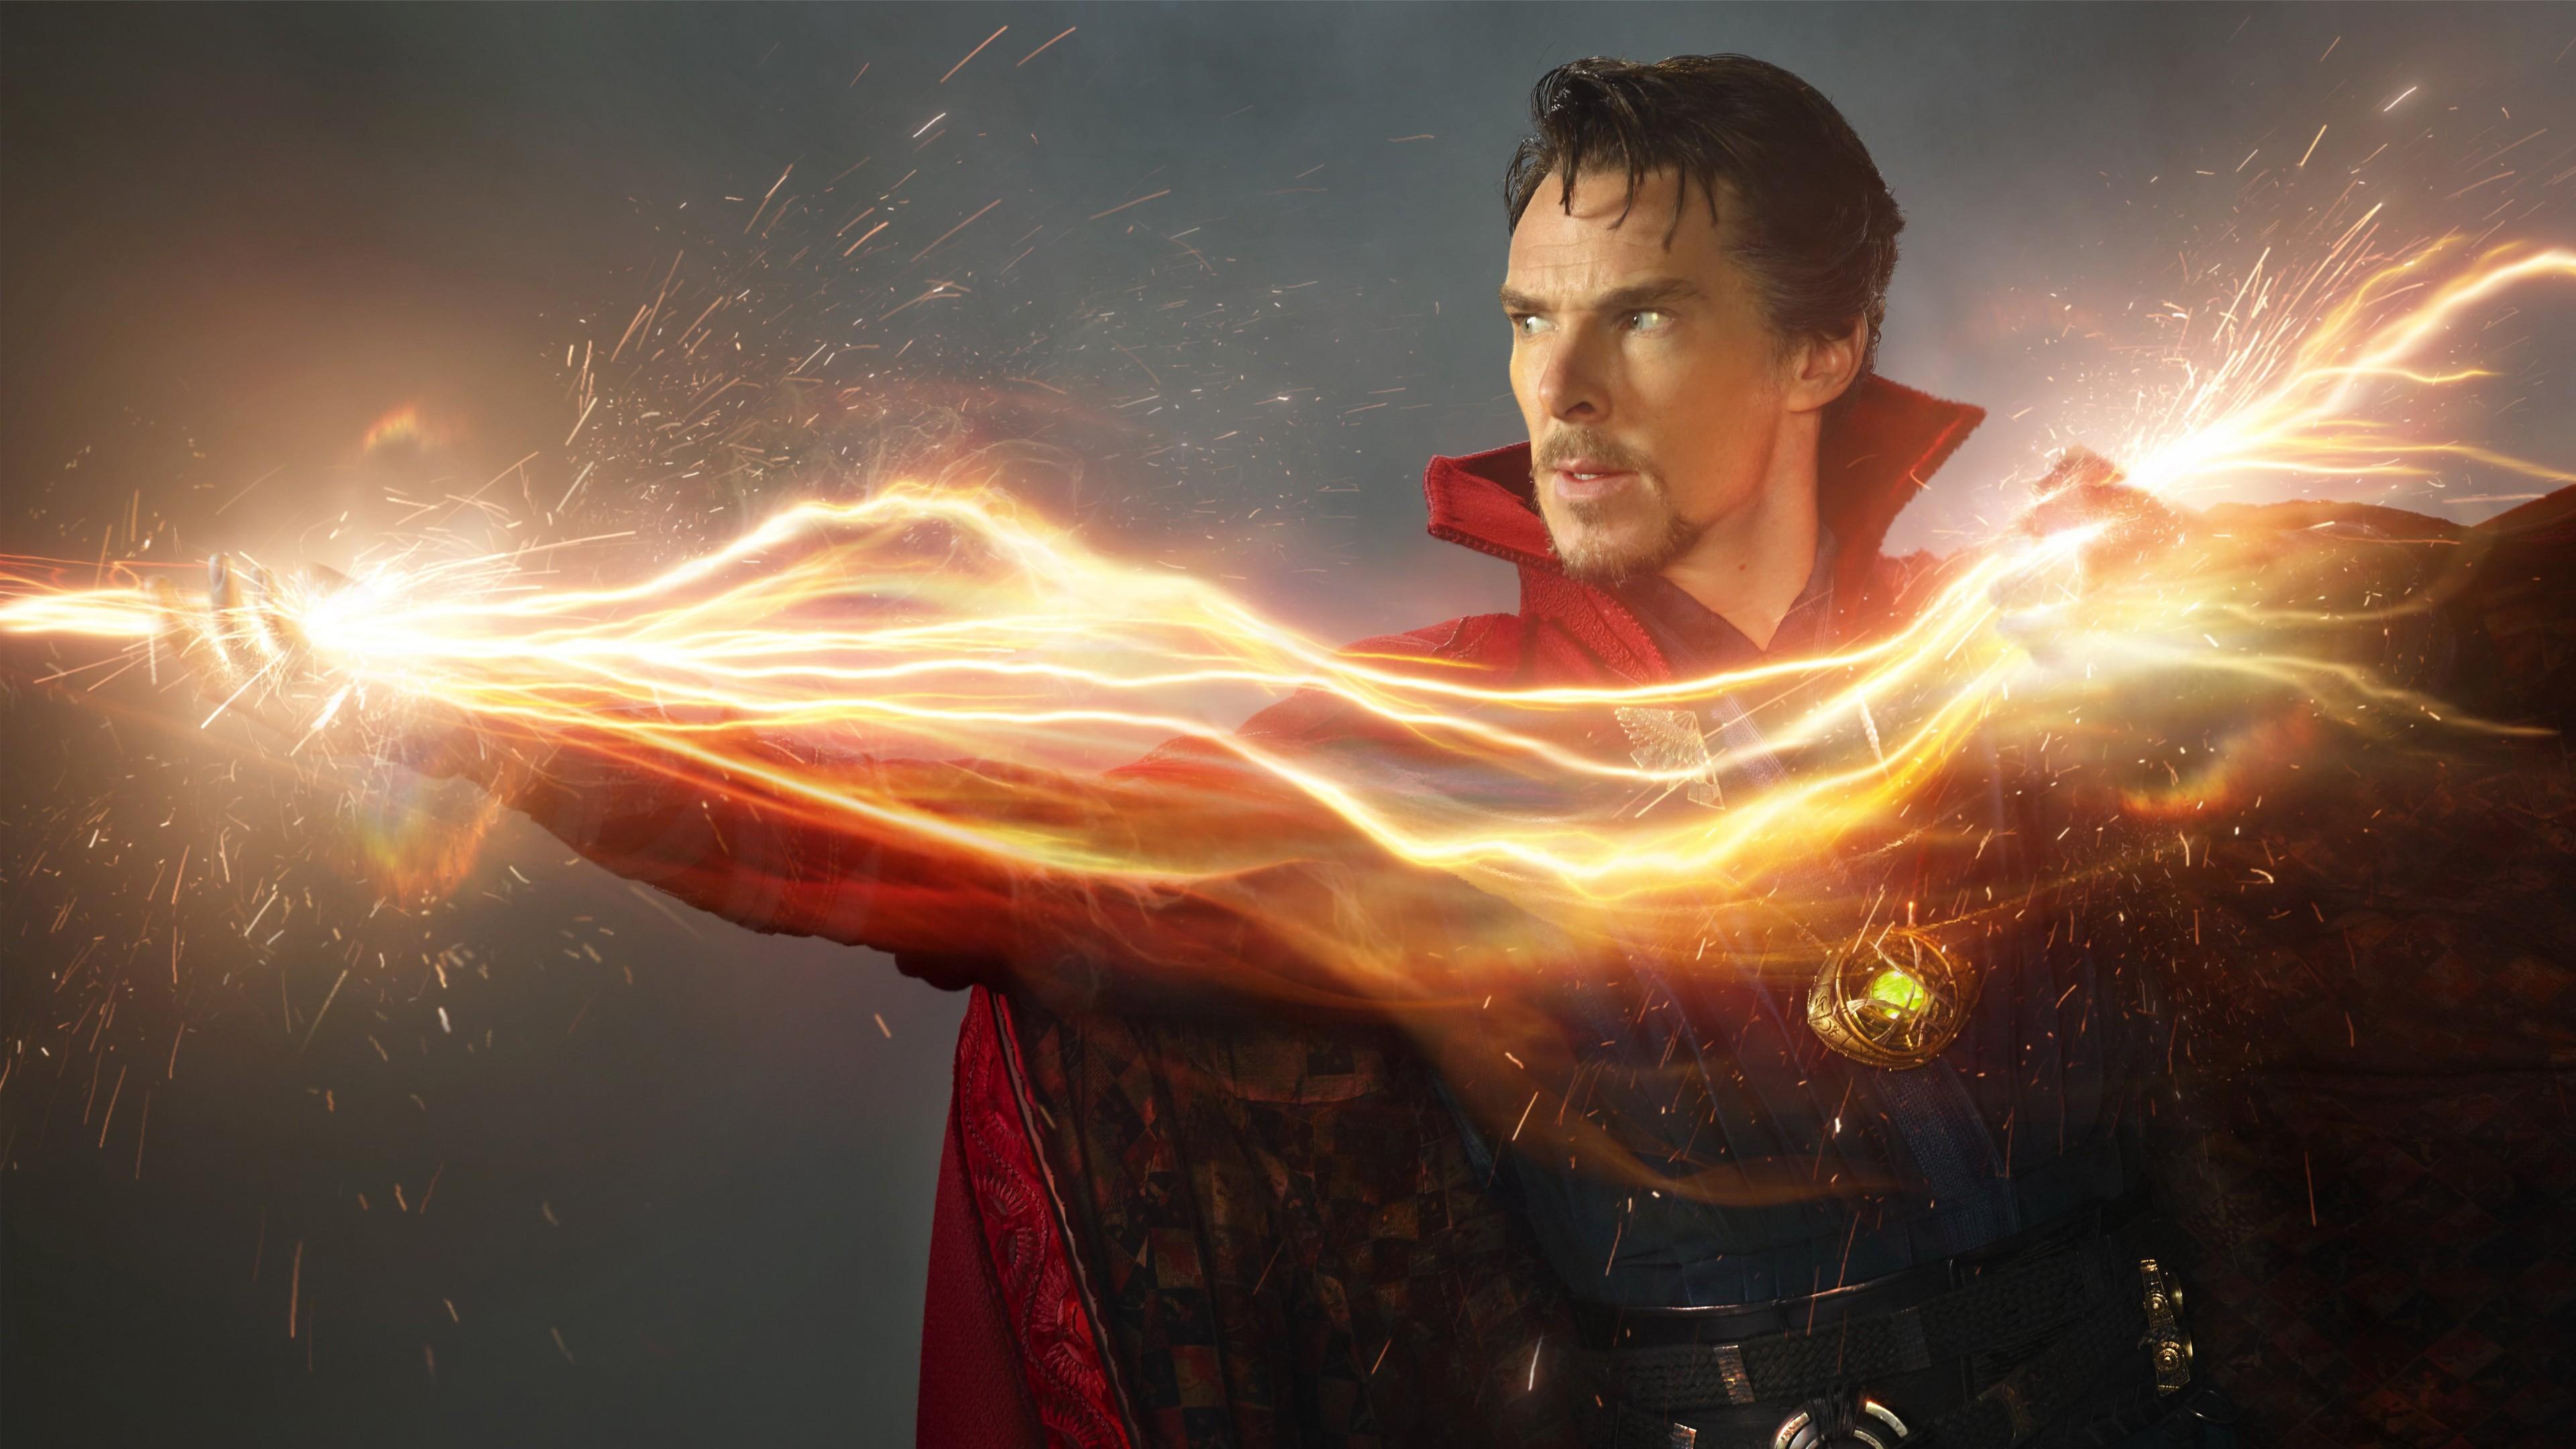 Doctor Strange Marvel Movie Wallpapers Widescreen Cinema: Doctor Strange, HD Movies, 4k Wallpapers, Images